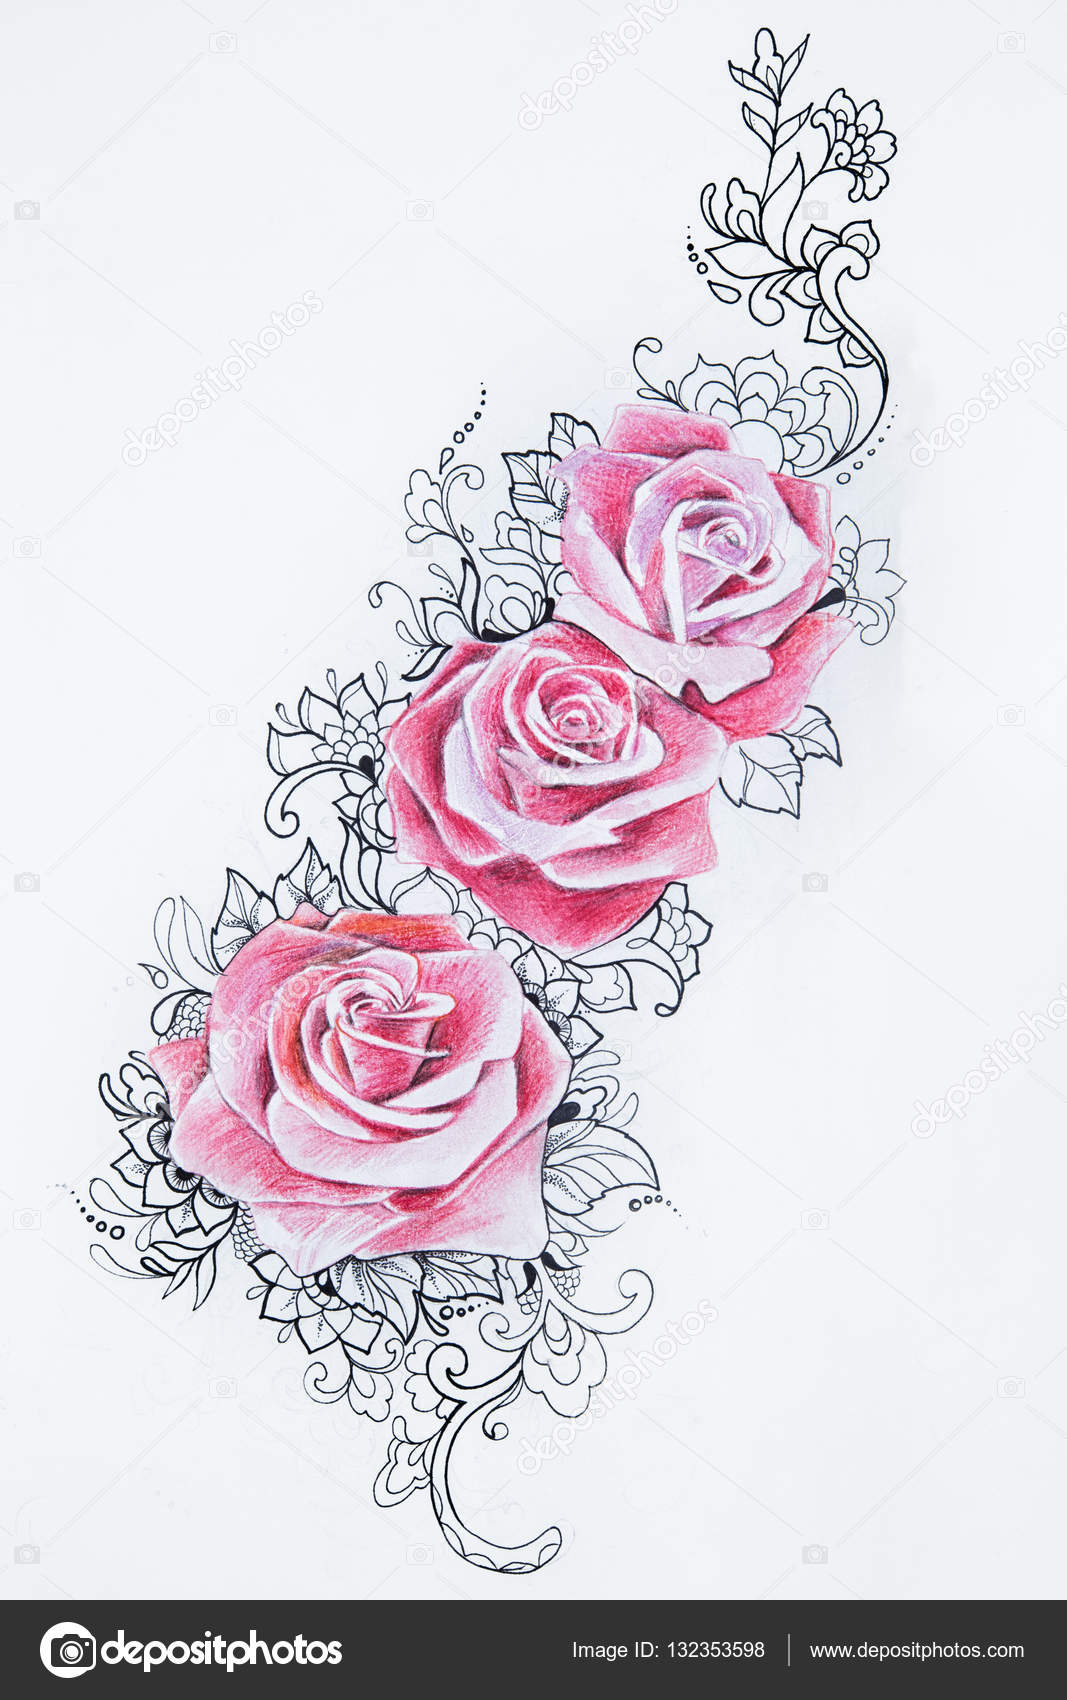 Dibujos Rosas Rojas Hermosas Dibujo De Hermosas Rosas Rojas Con